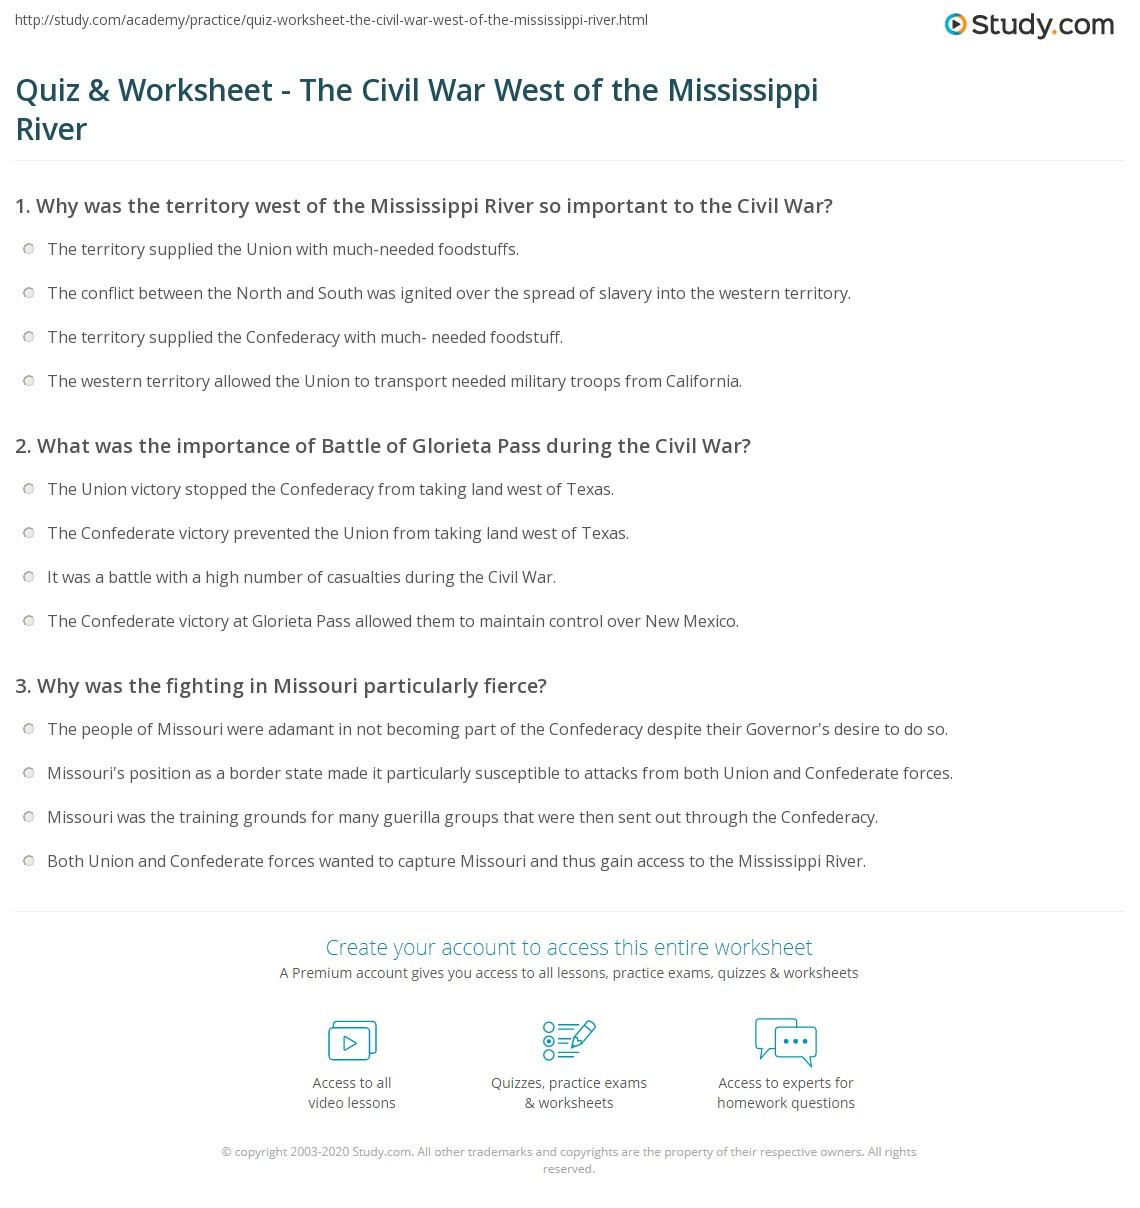 Quiz Worksheet The Civil War West Of The Mississippi River